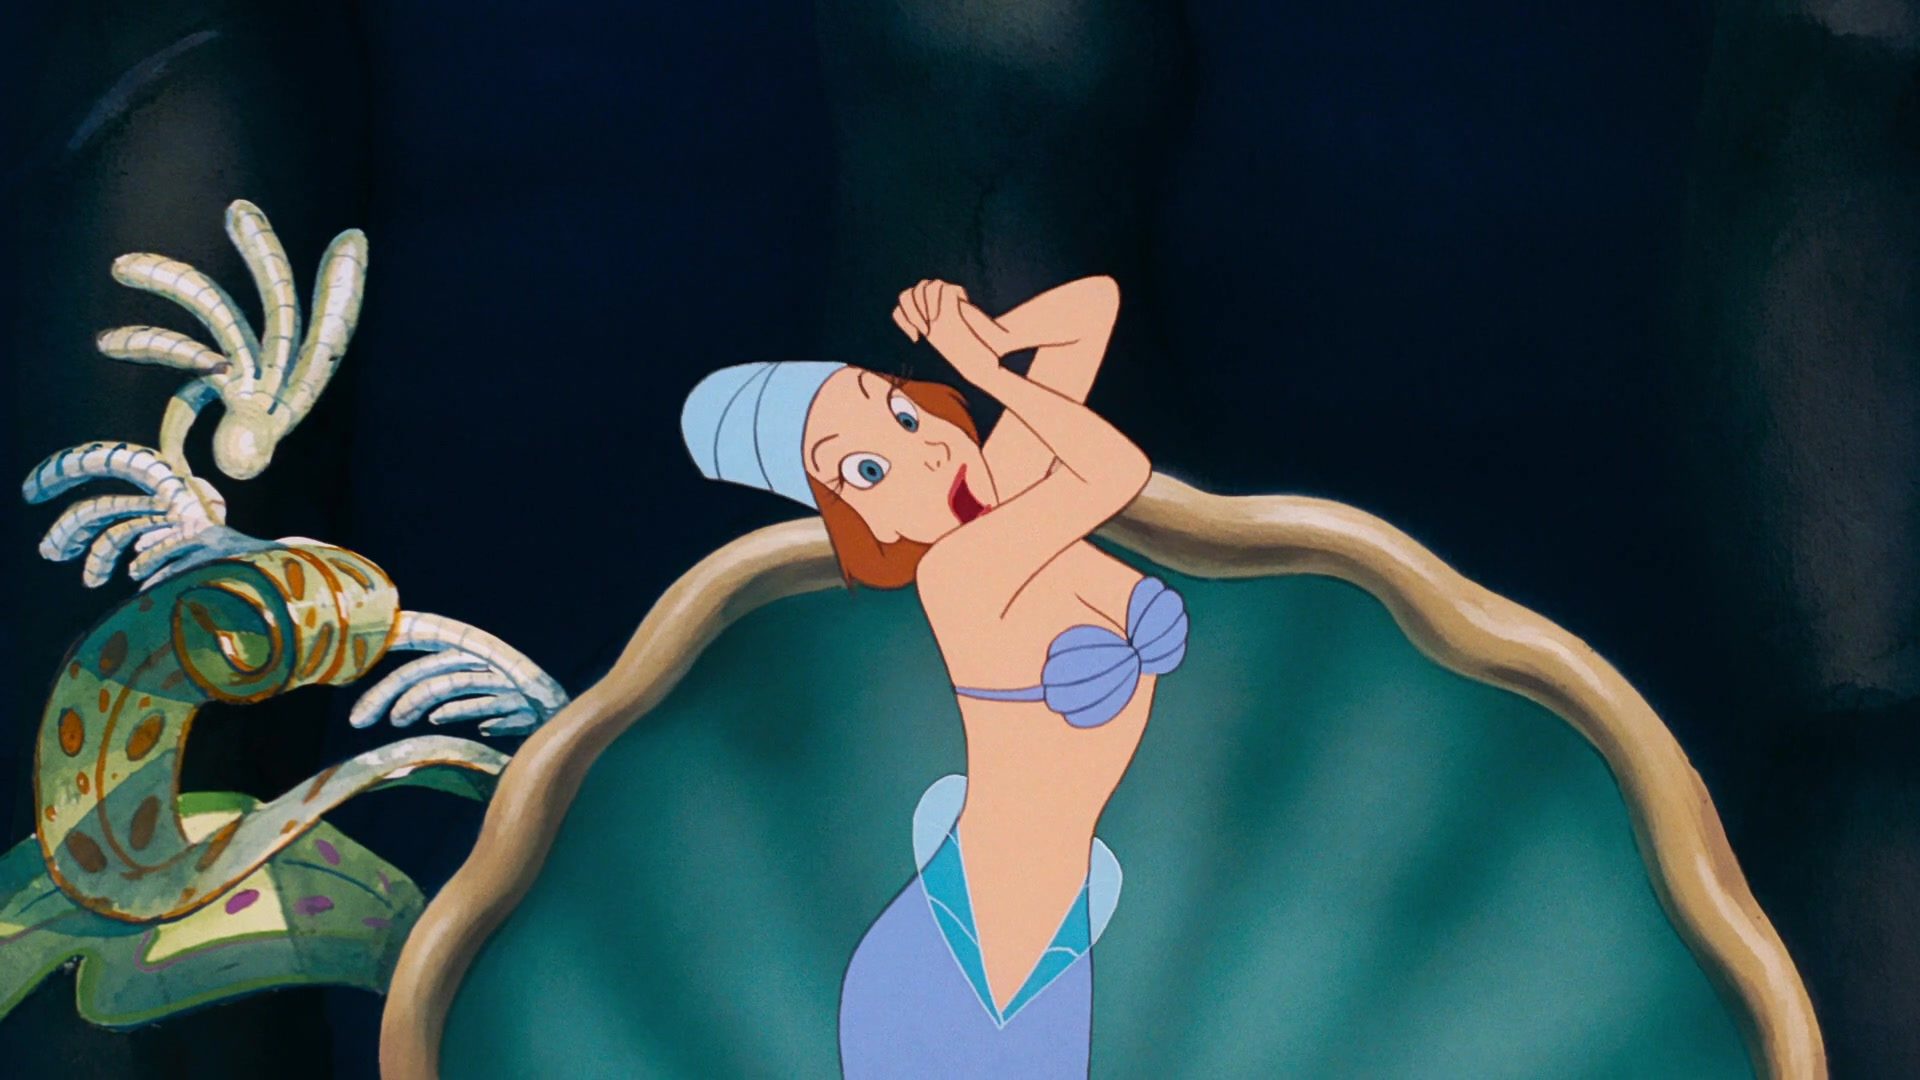 Nude little mermaid videos sexy videos